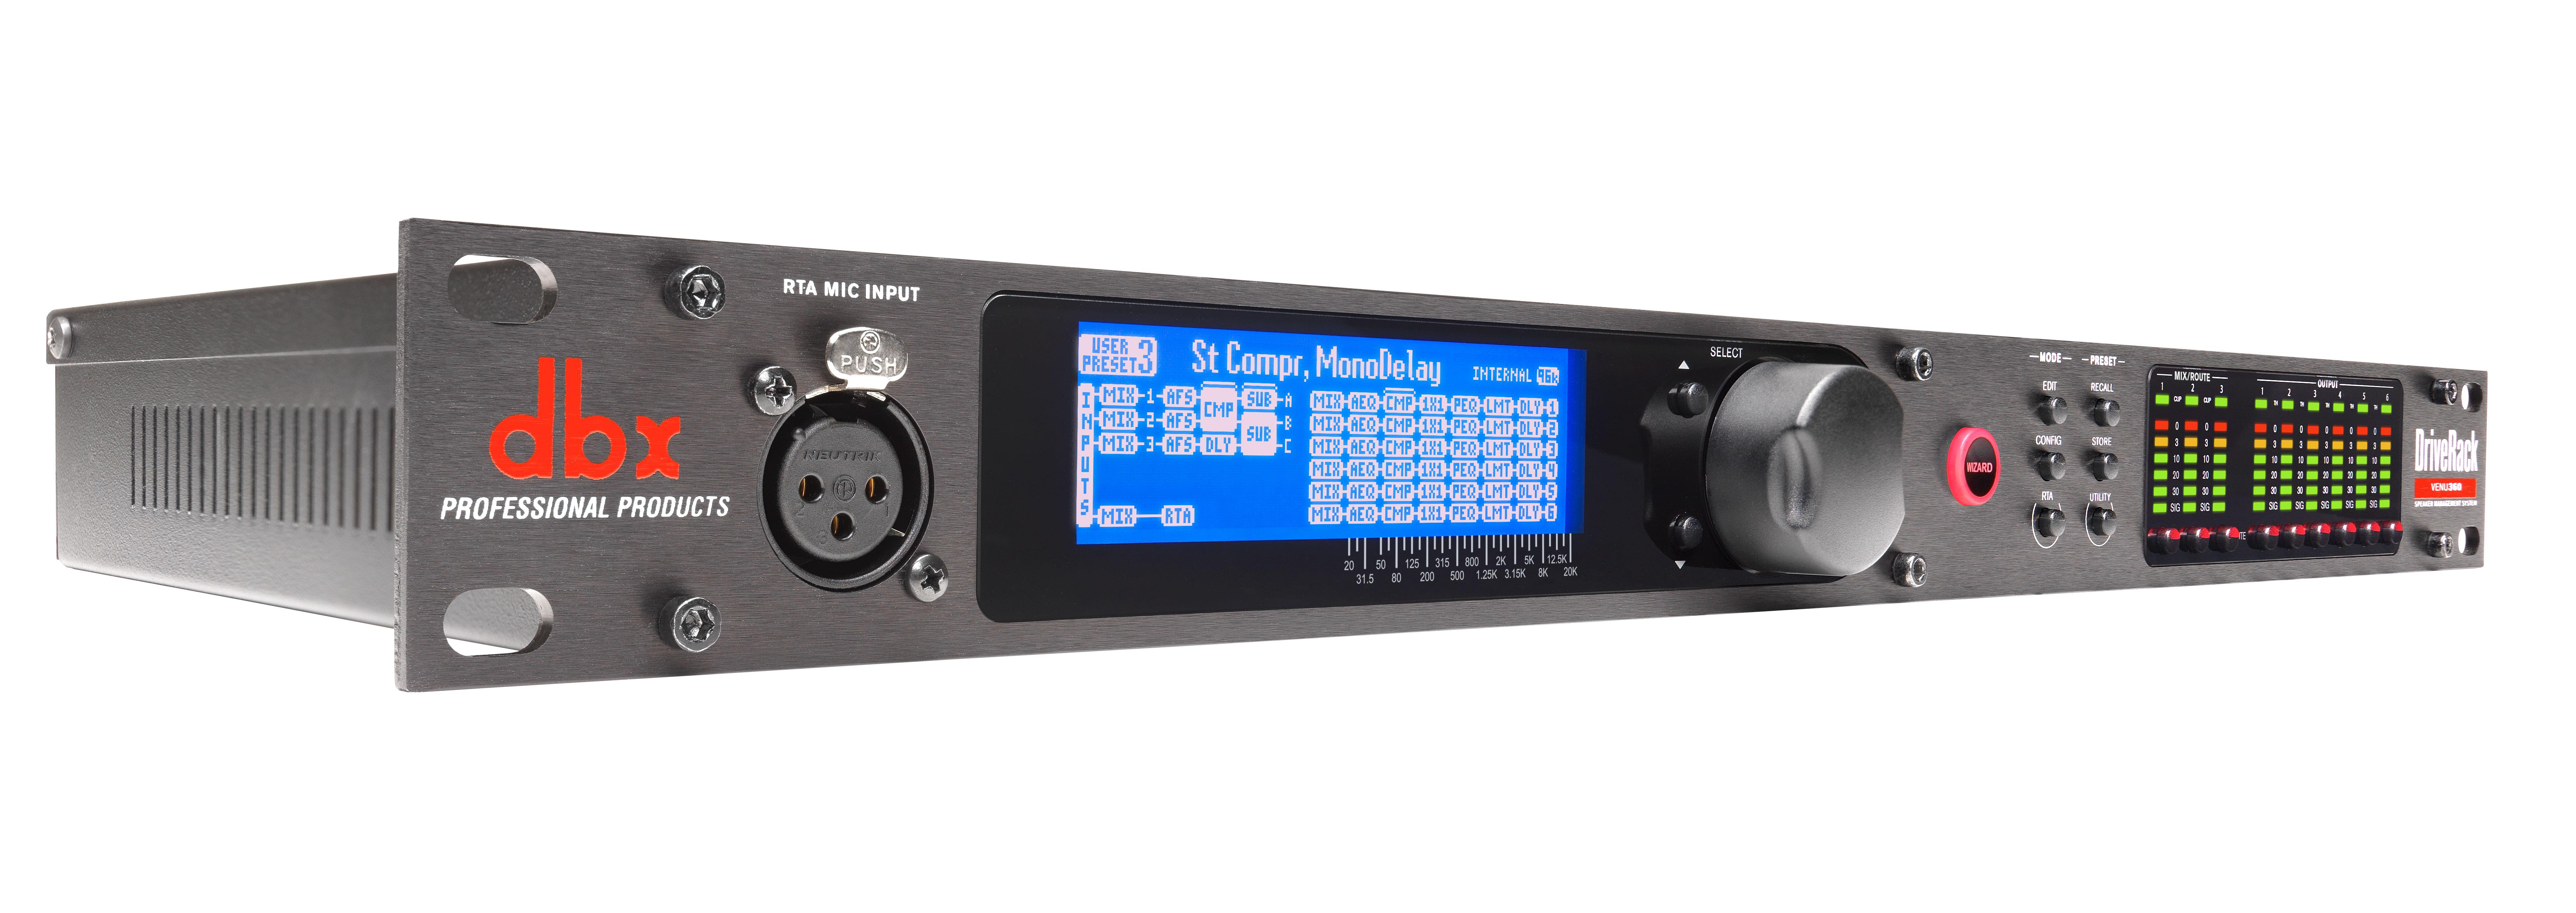 Driverack Venu360 Dbx Professional Audio Simpletouchtonesuptmsupgenerator Signalprocessing Circuit Angle Tiny Square